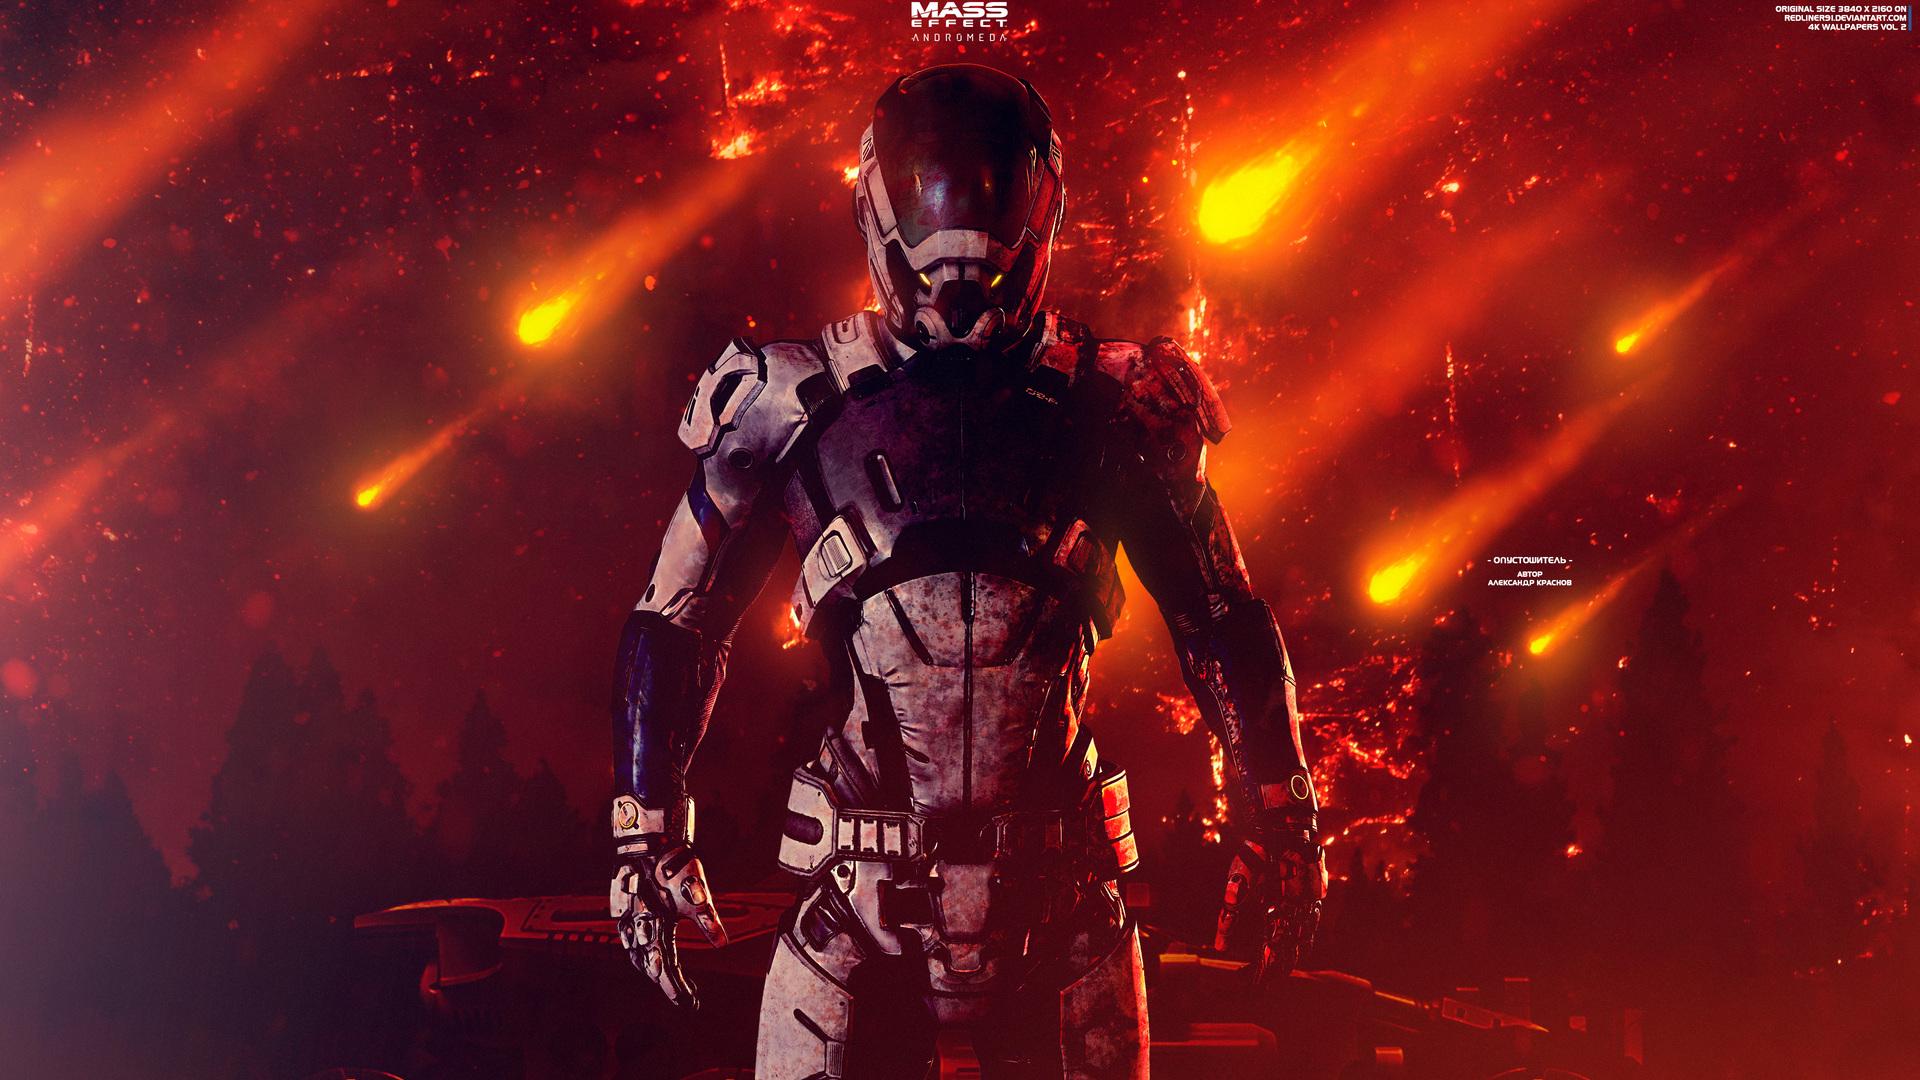 Mass Effect Andromeda 1920x1080: 1920x1080 4k Mass Effect Andromeda HD Laptop Full HD 1080P